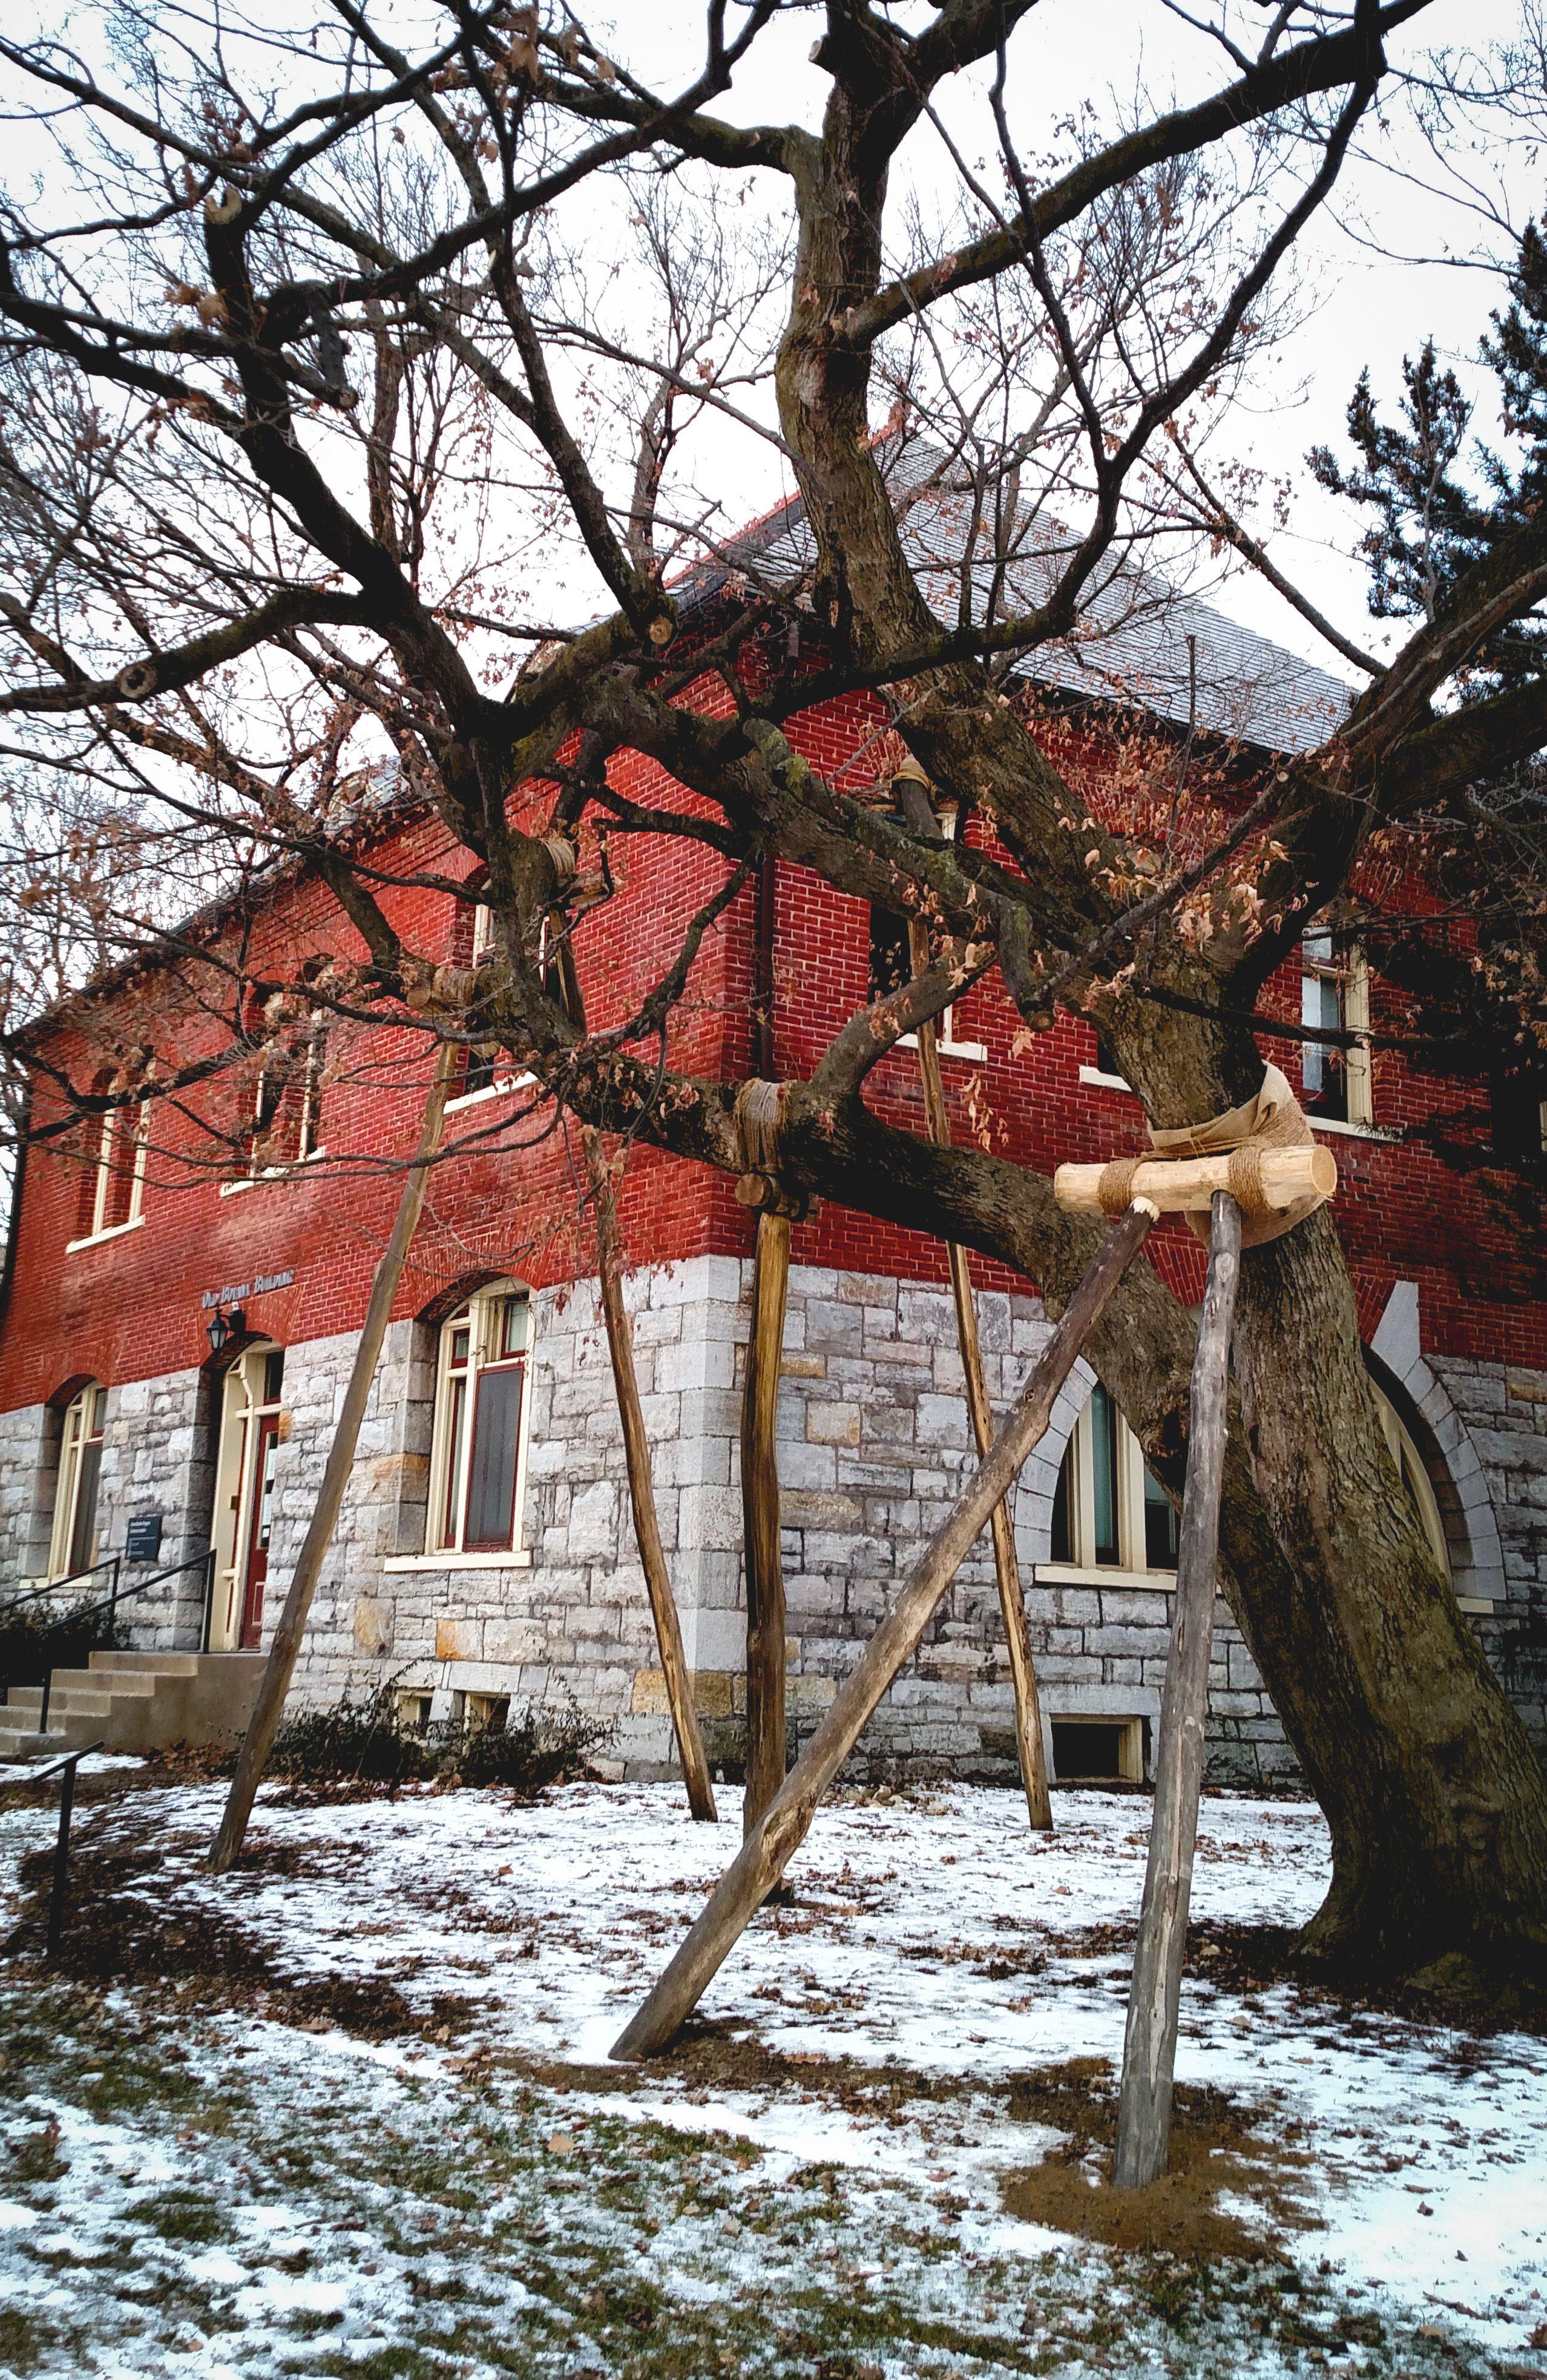 limb walkers tree service on penn state heritage tree gains international support penn state university tree support japanese tree tree preservation tree support japanese tree